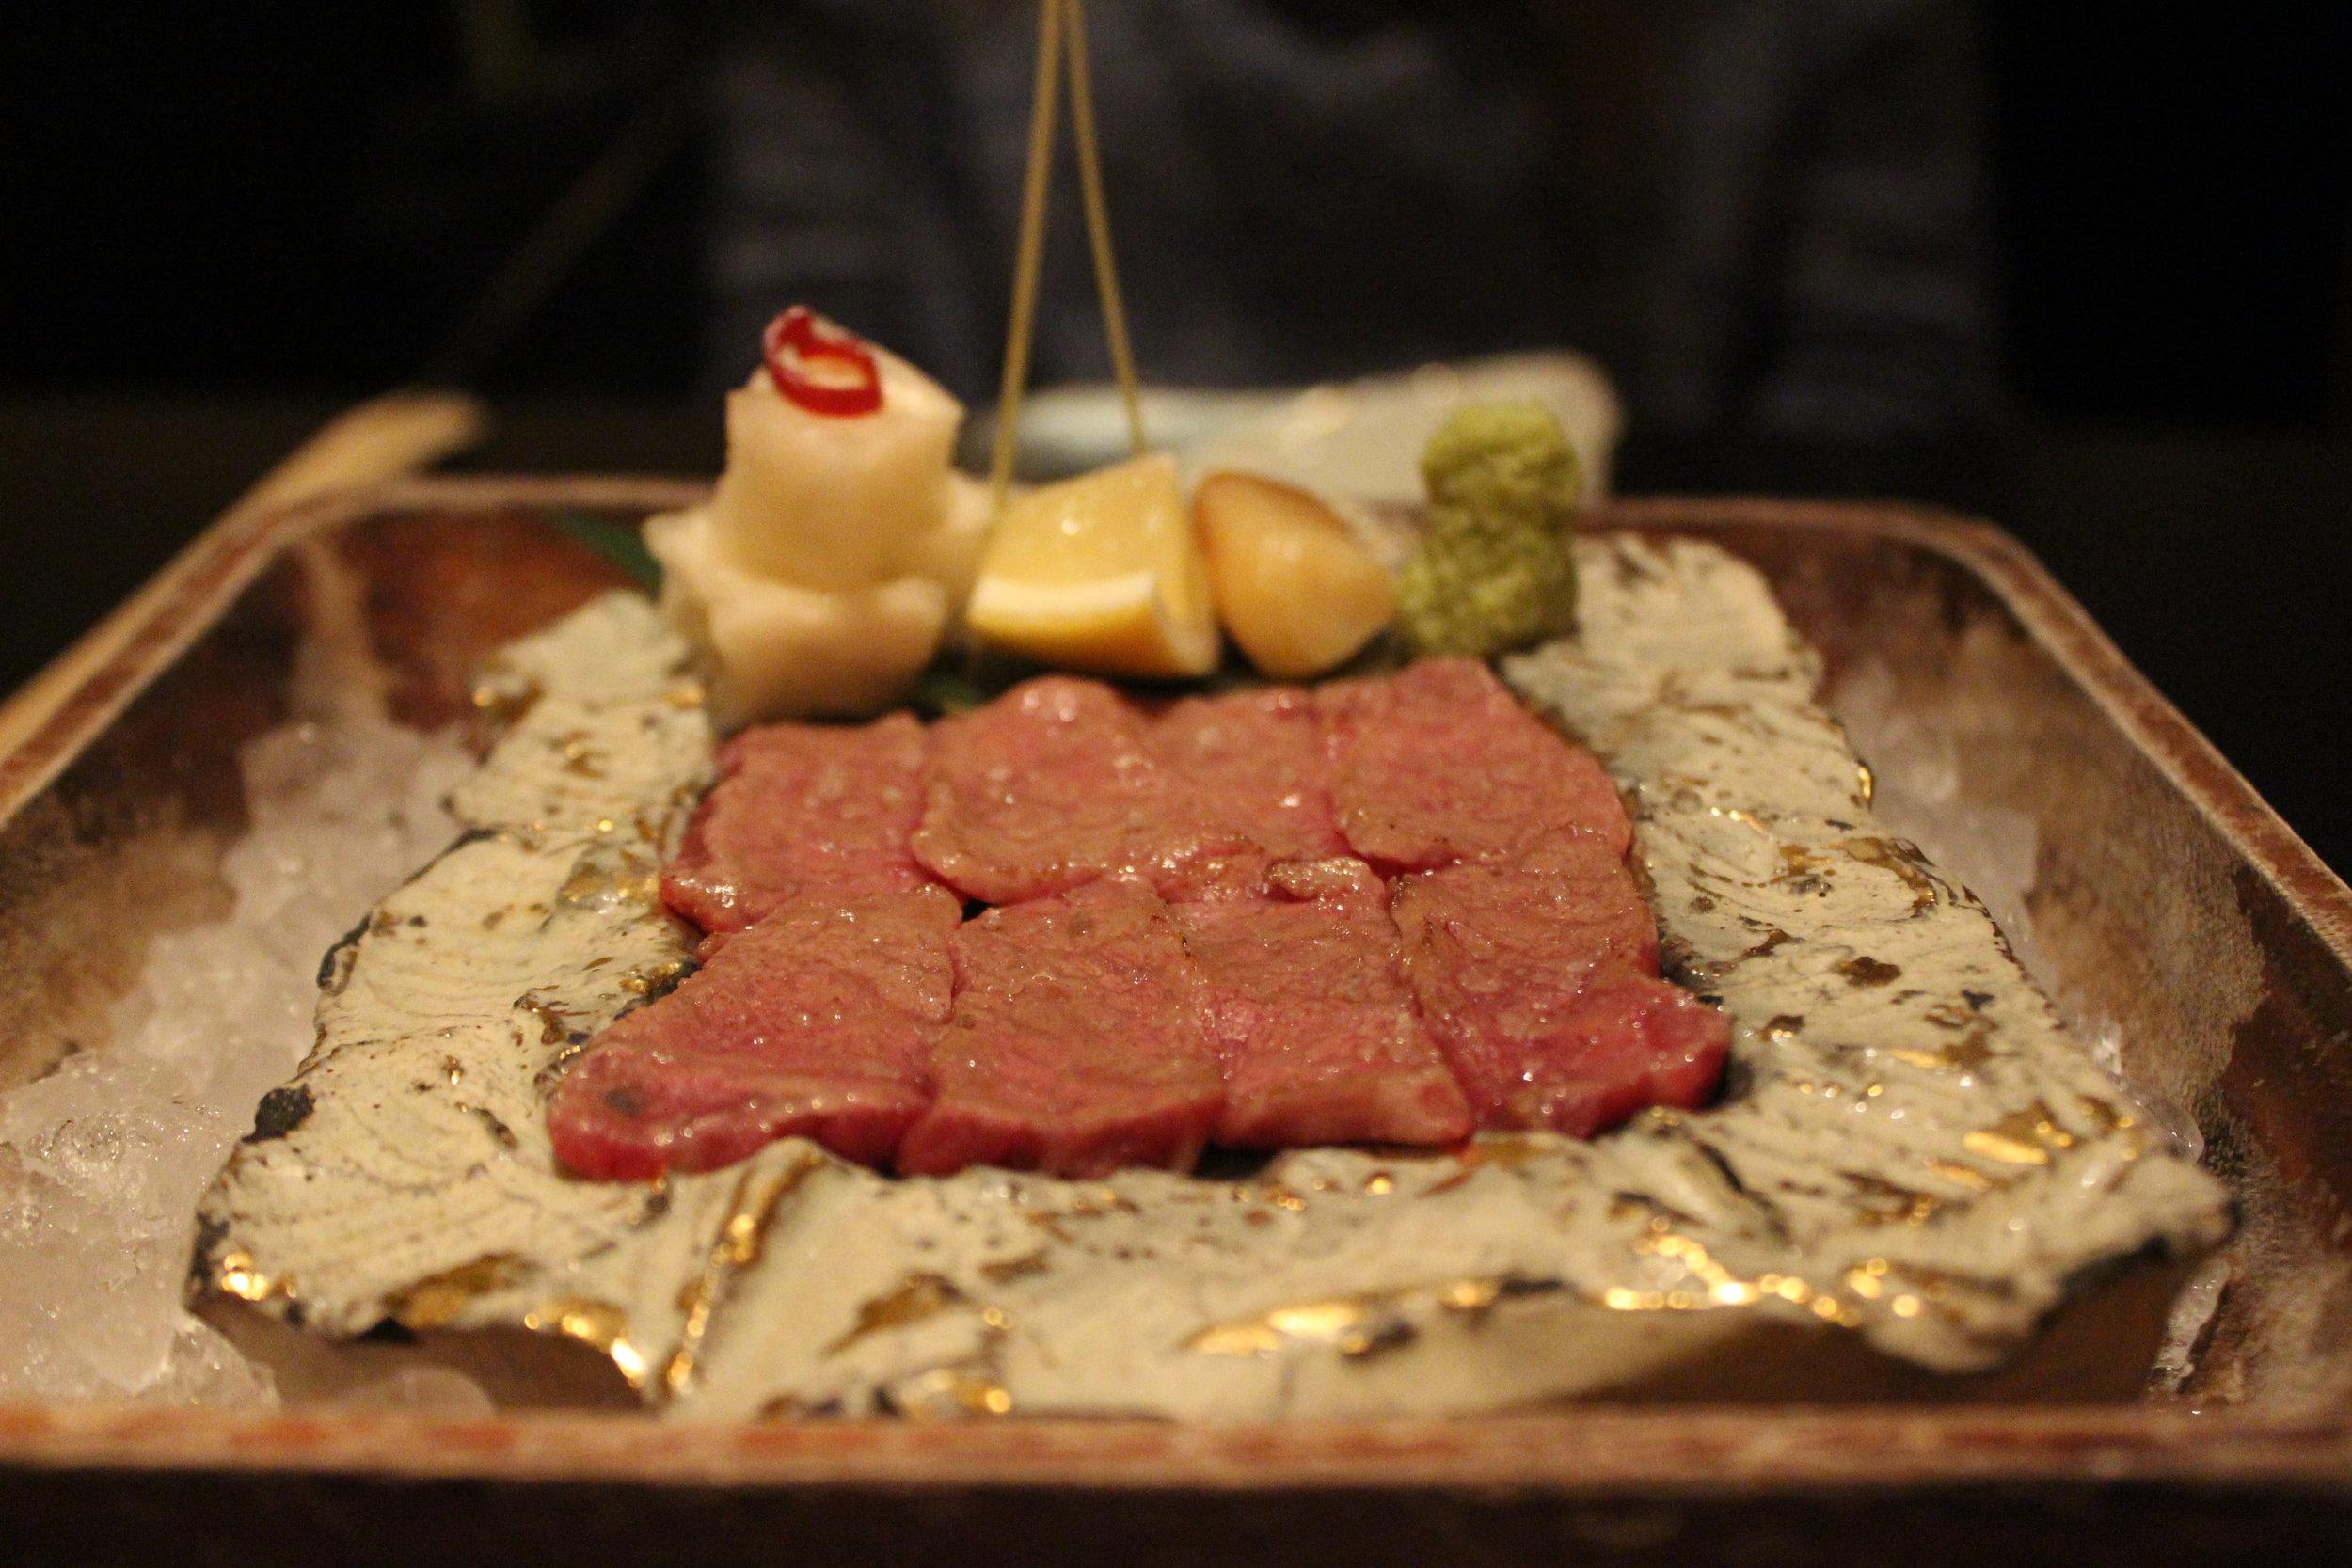 Washu-Beef Short Rib Sashimi with Sweet Daikon-pickle and Soy Sauce Garlic